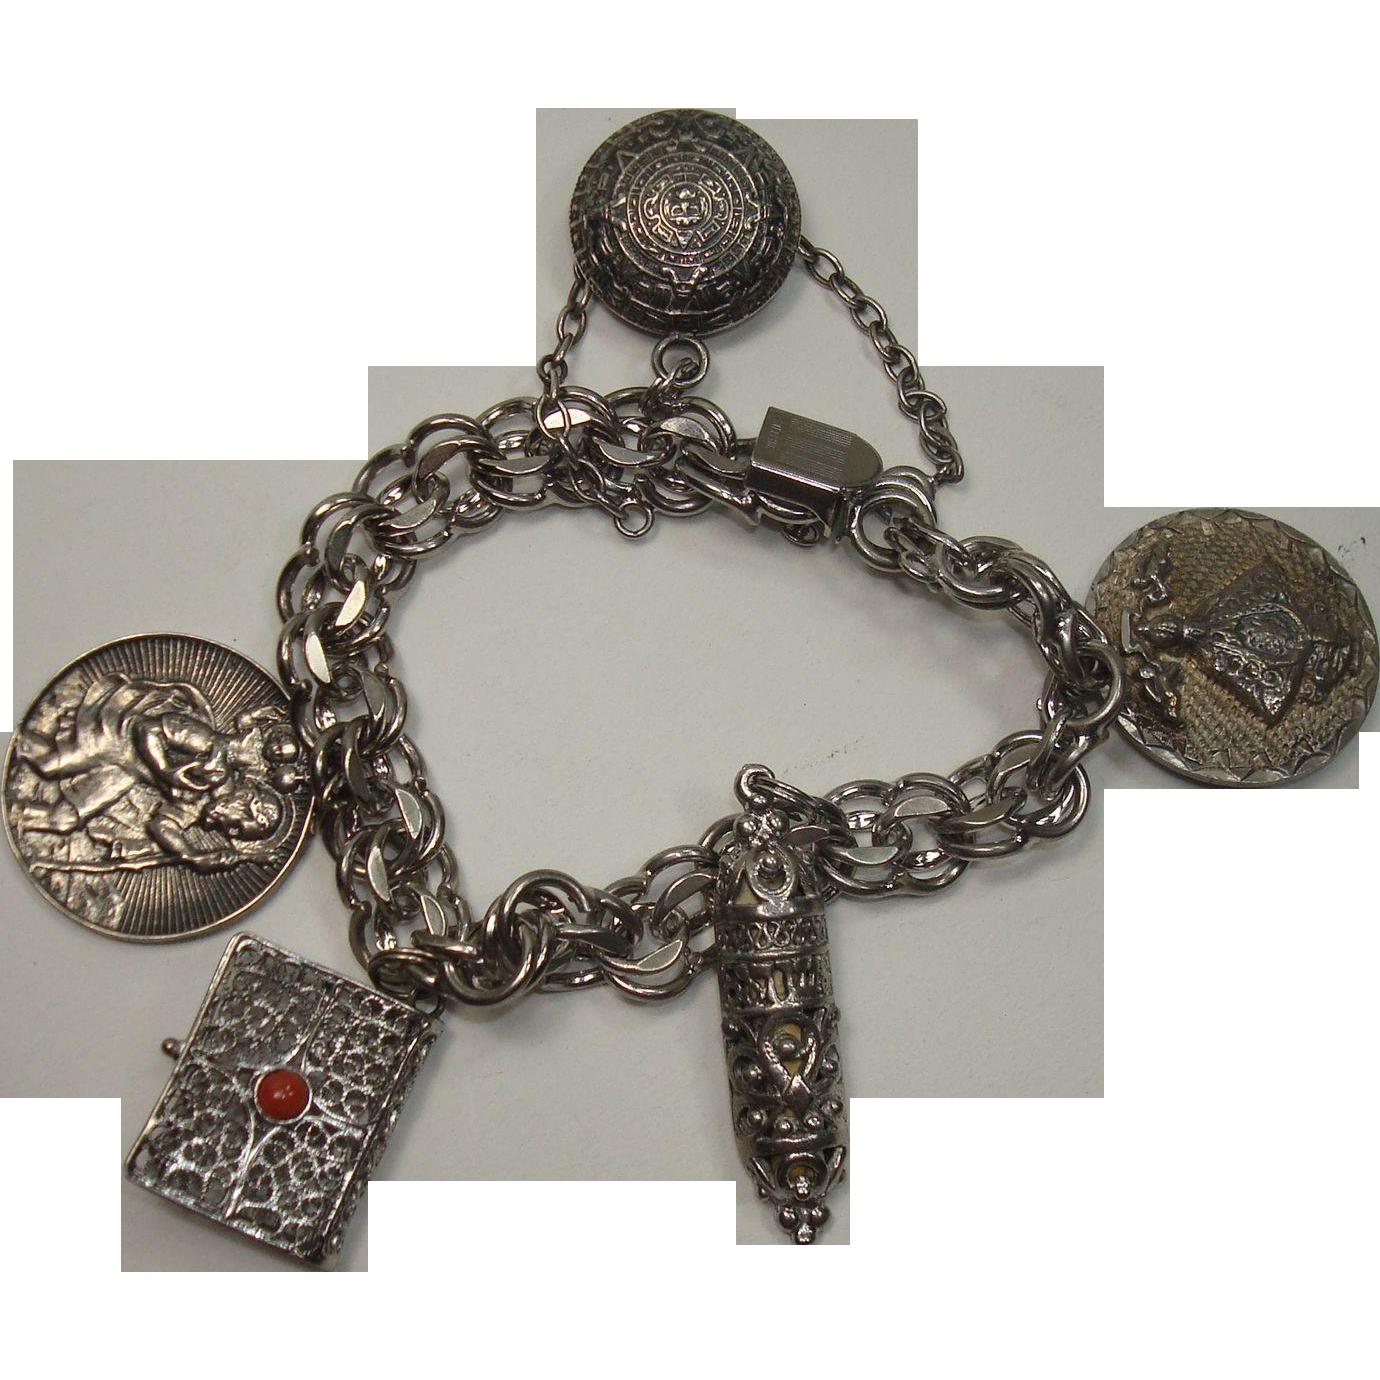 Heavy Sterling Religious Theme Charm Bracelet